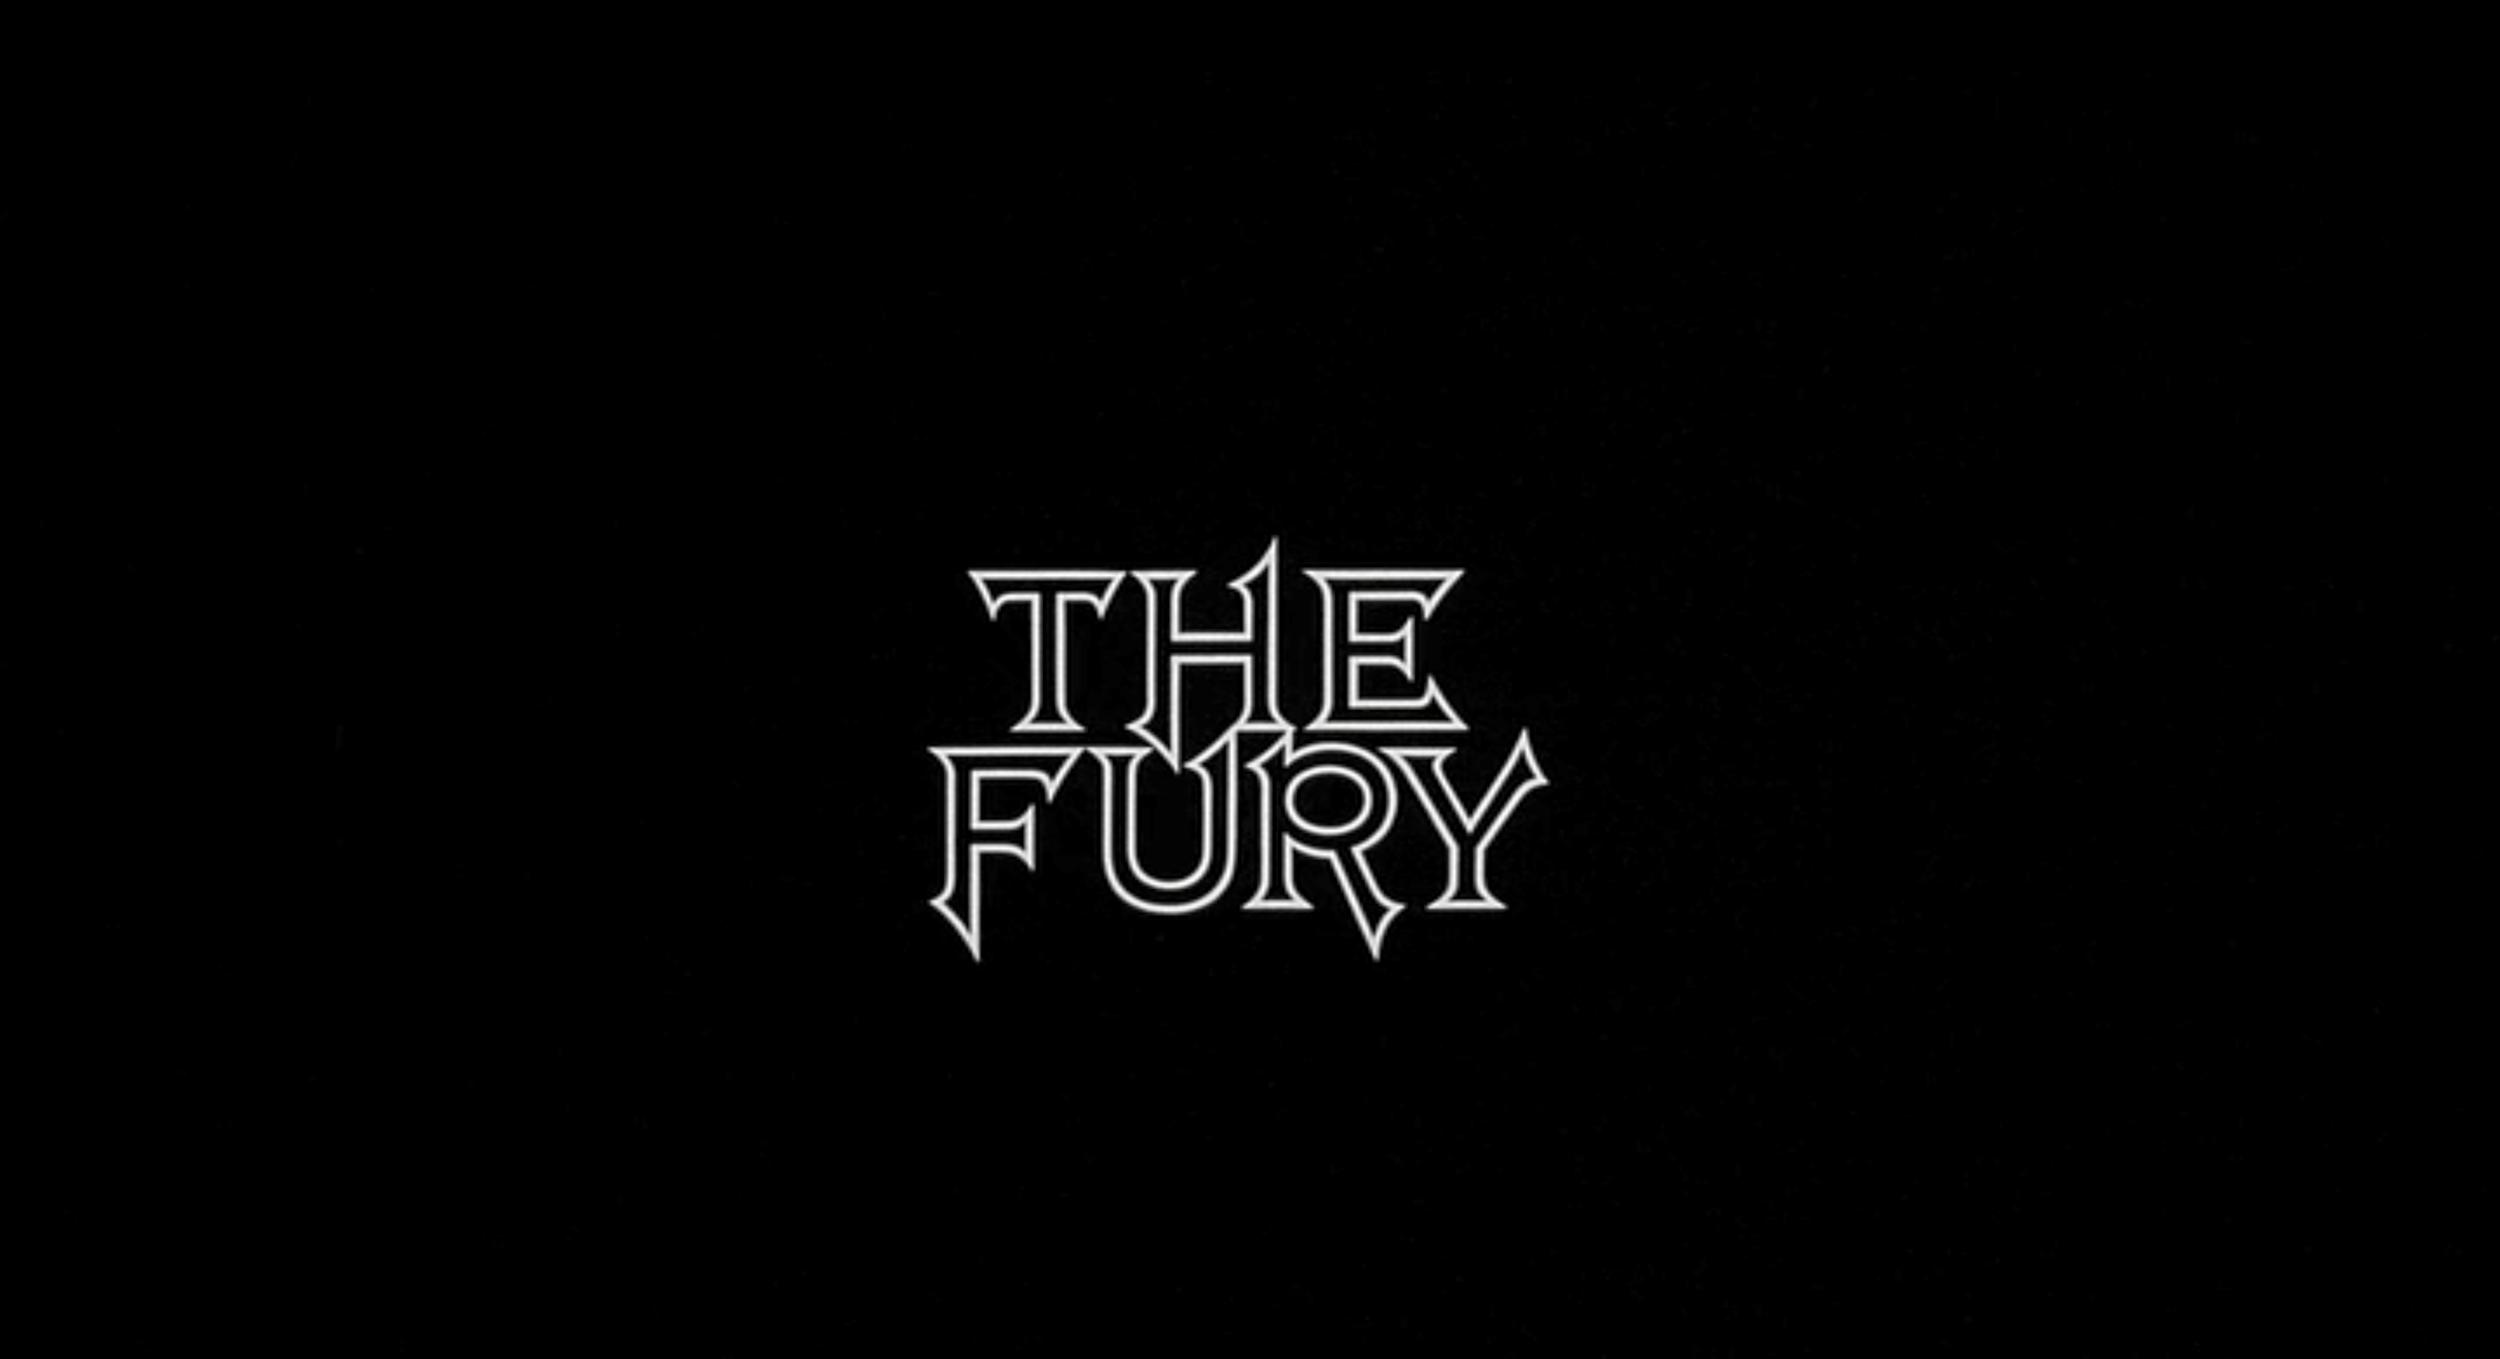 Brian De Palma: The Fury, 1978: Title Card